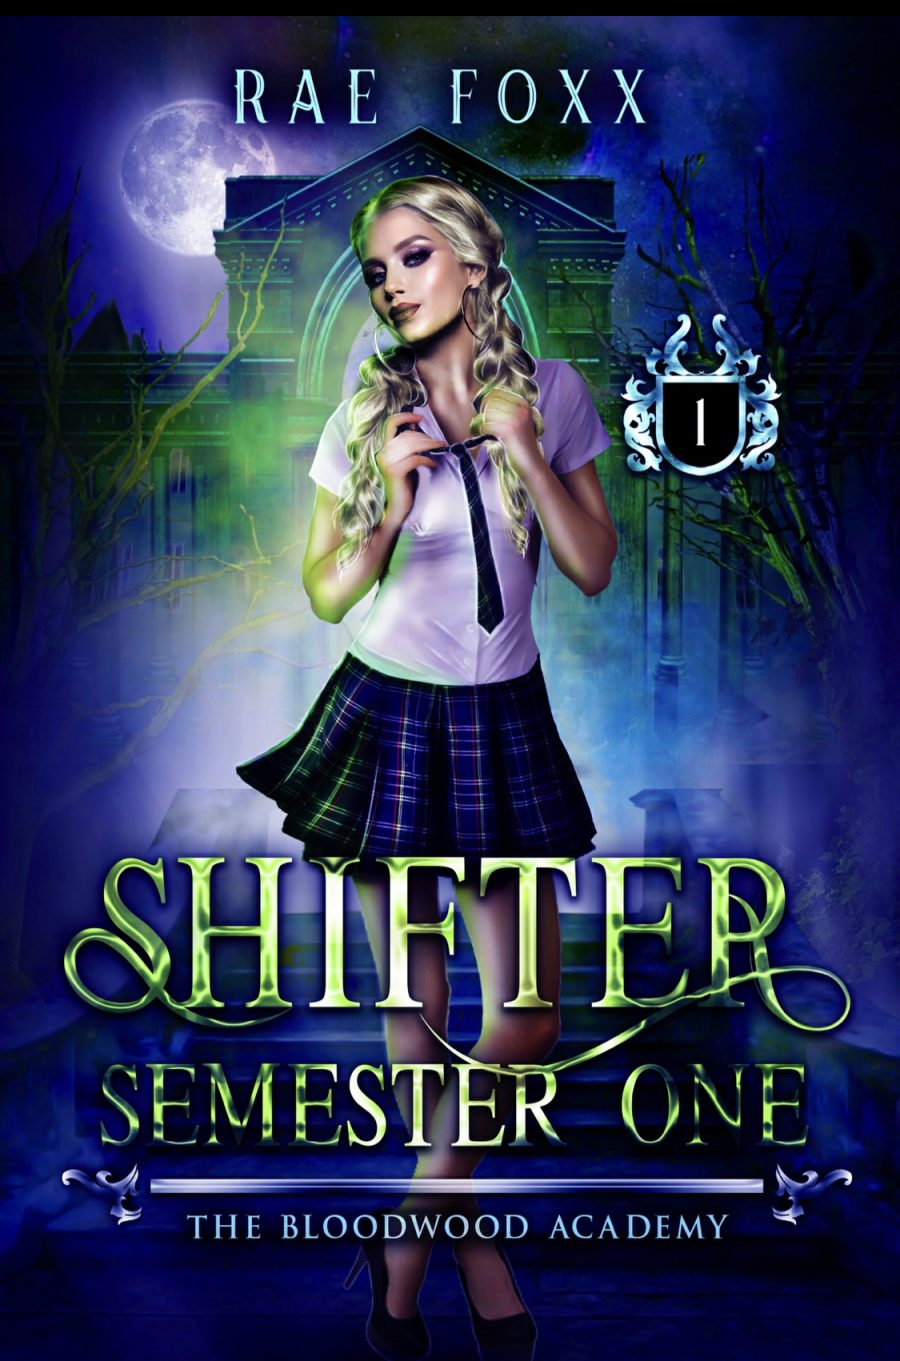 Shifter: Semester One (The Bloodwood Academy - Book 1) by Rae Foxx - A Book Review #BookReview #FastBurn #RH #Academy #PNR #Steamy